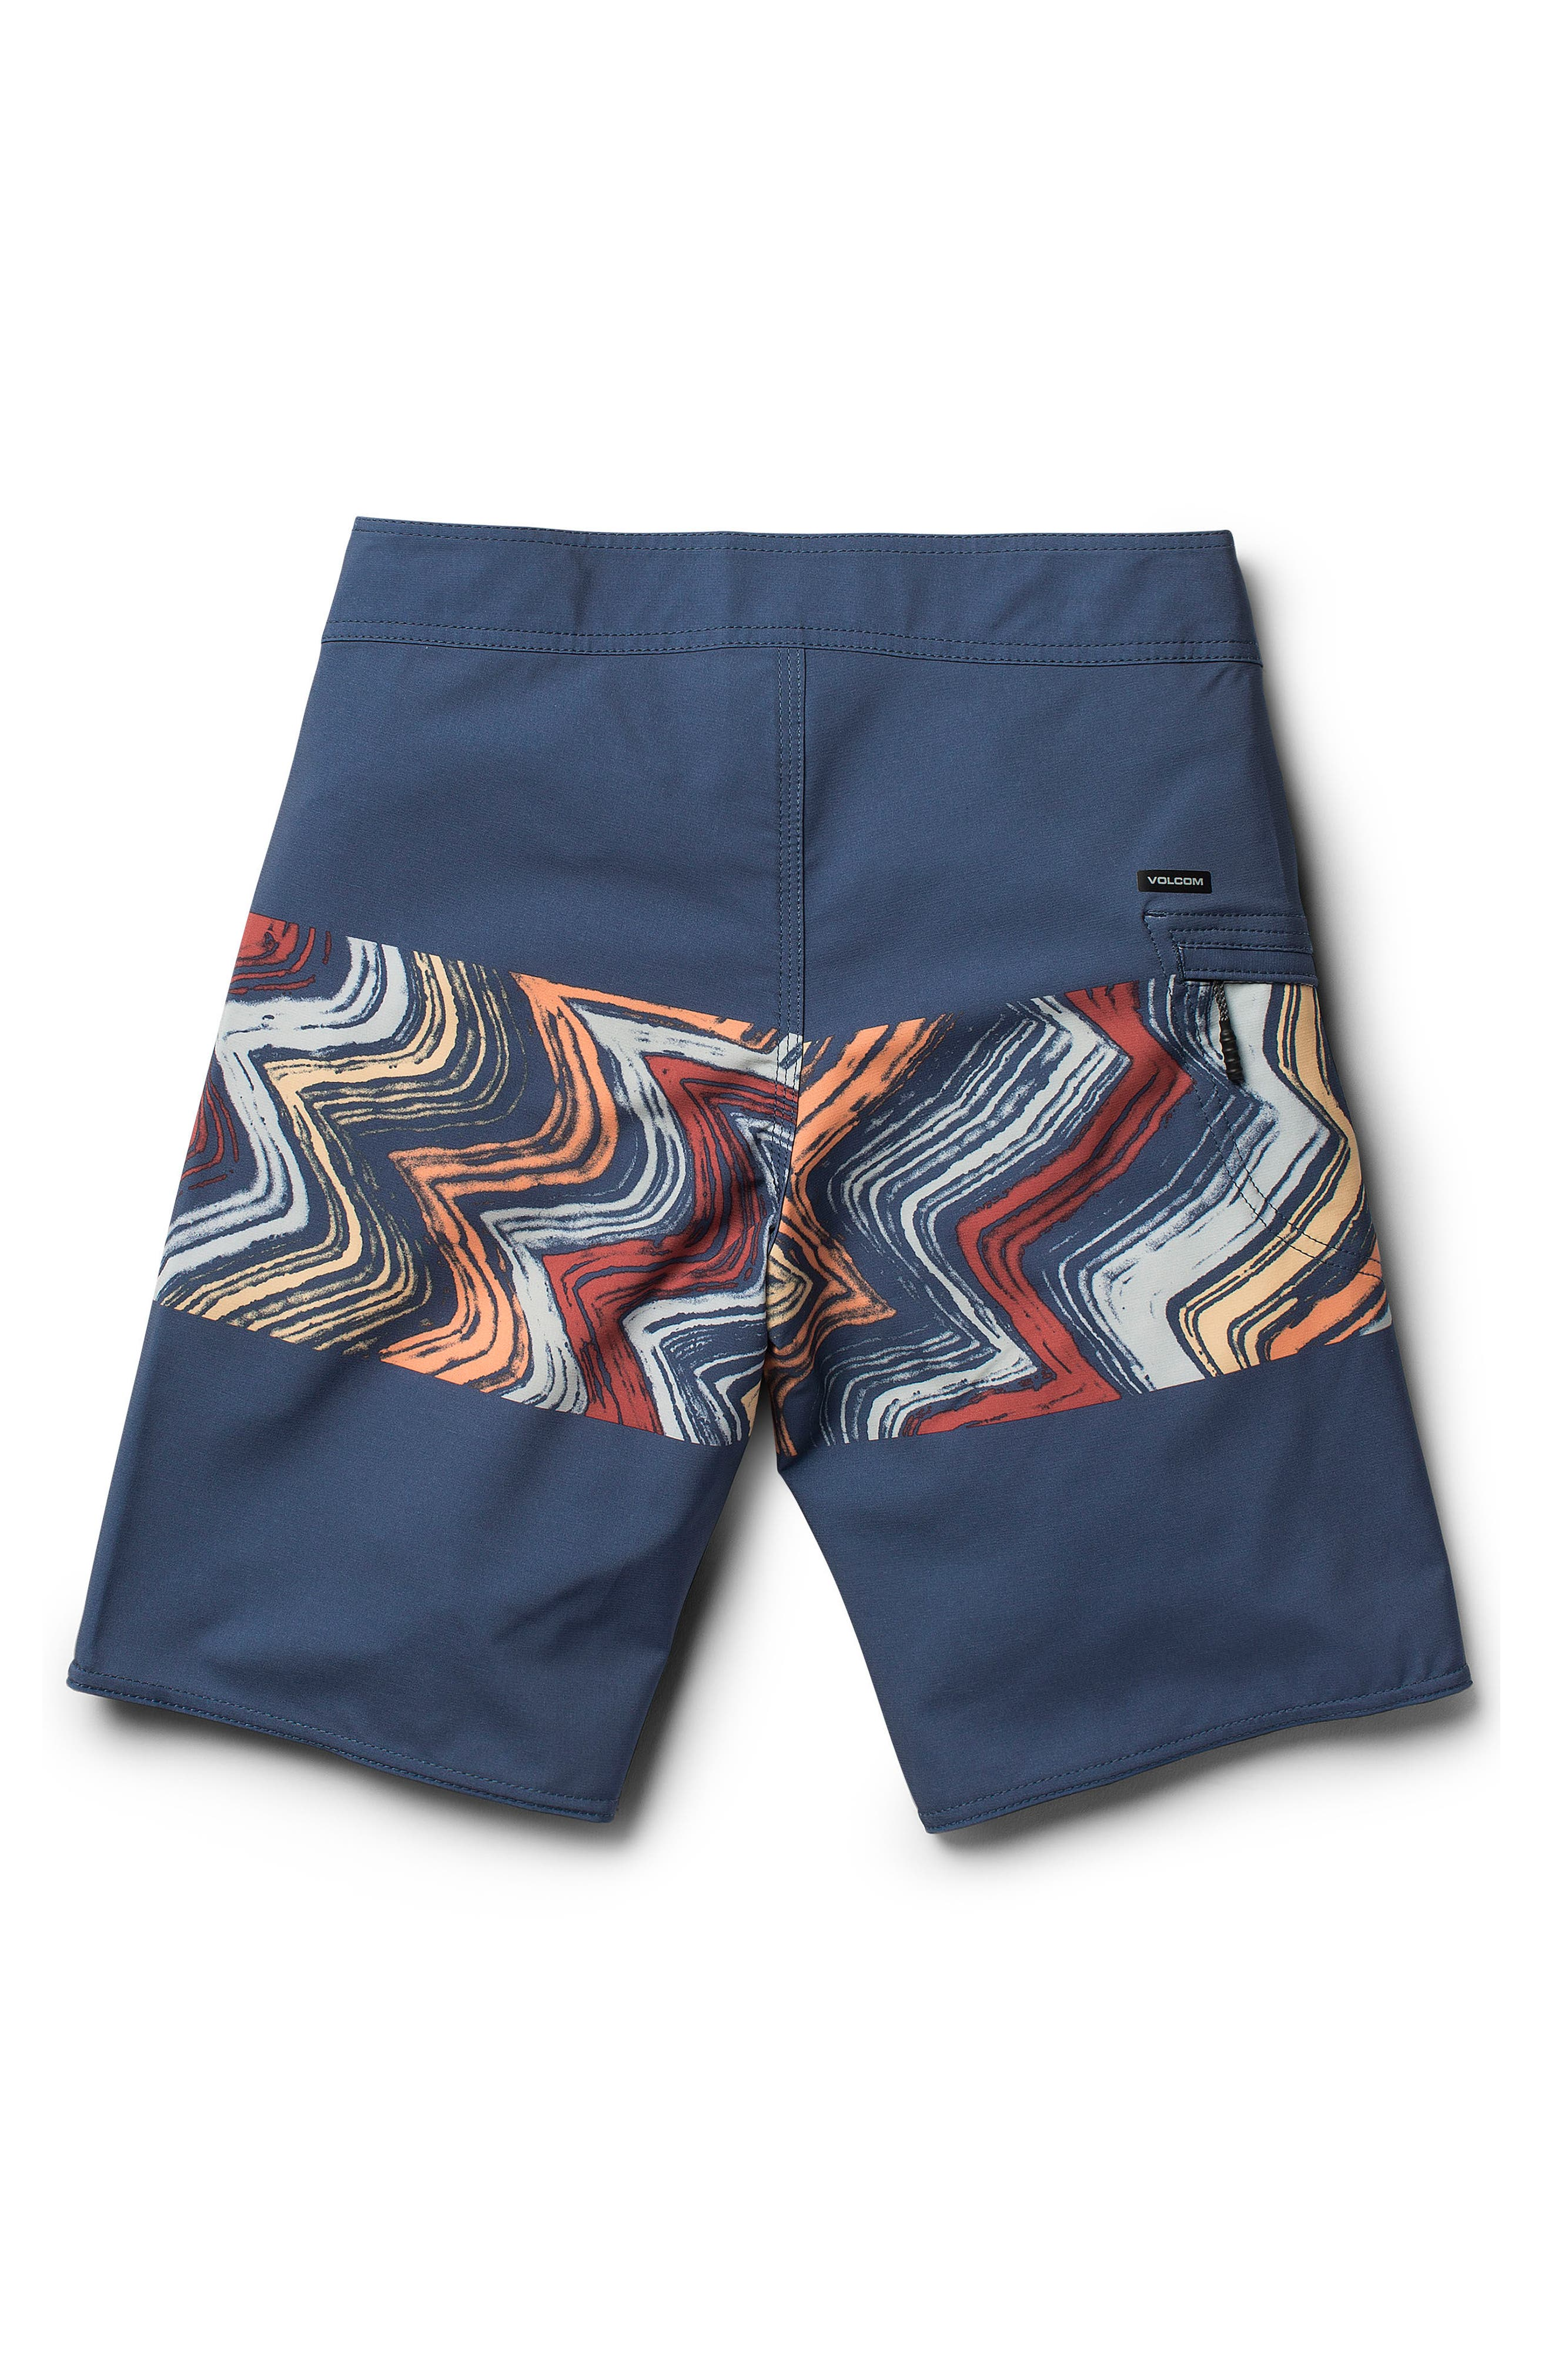 Macaw Board Shorts,                             Alternate thumbnail 2, color,                             Sunburst